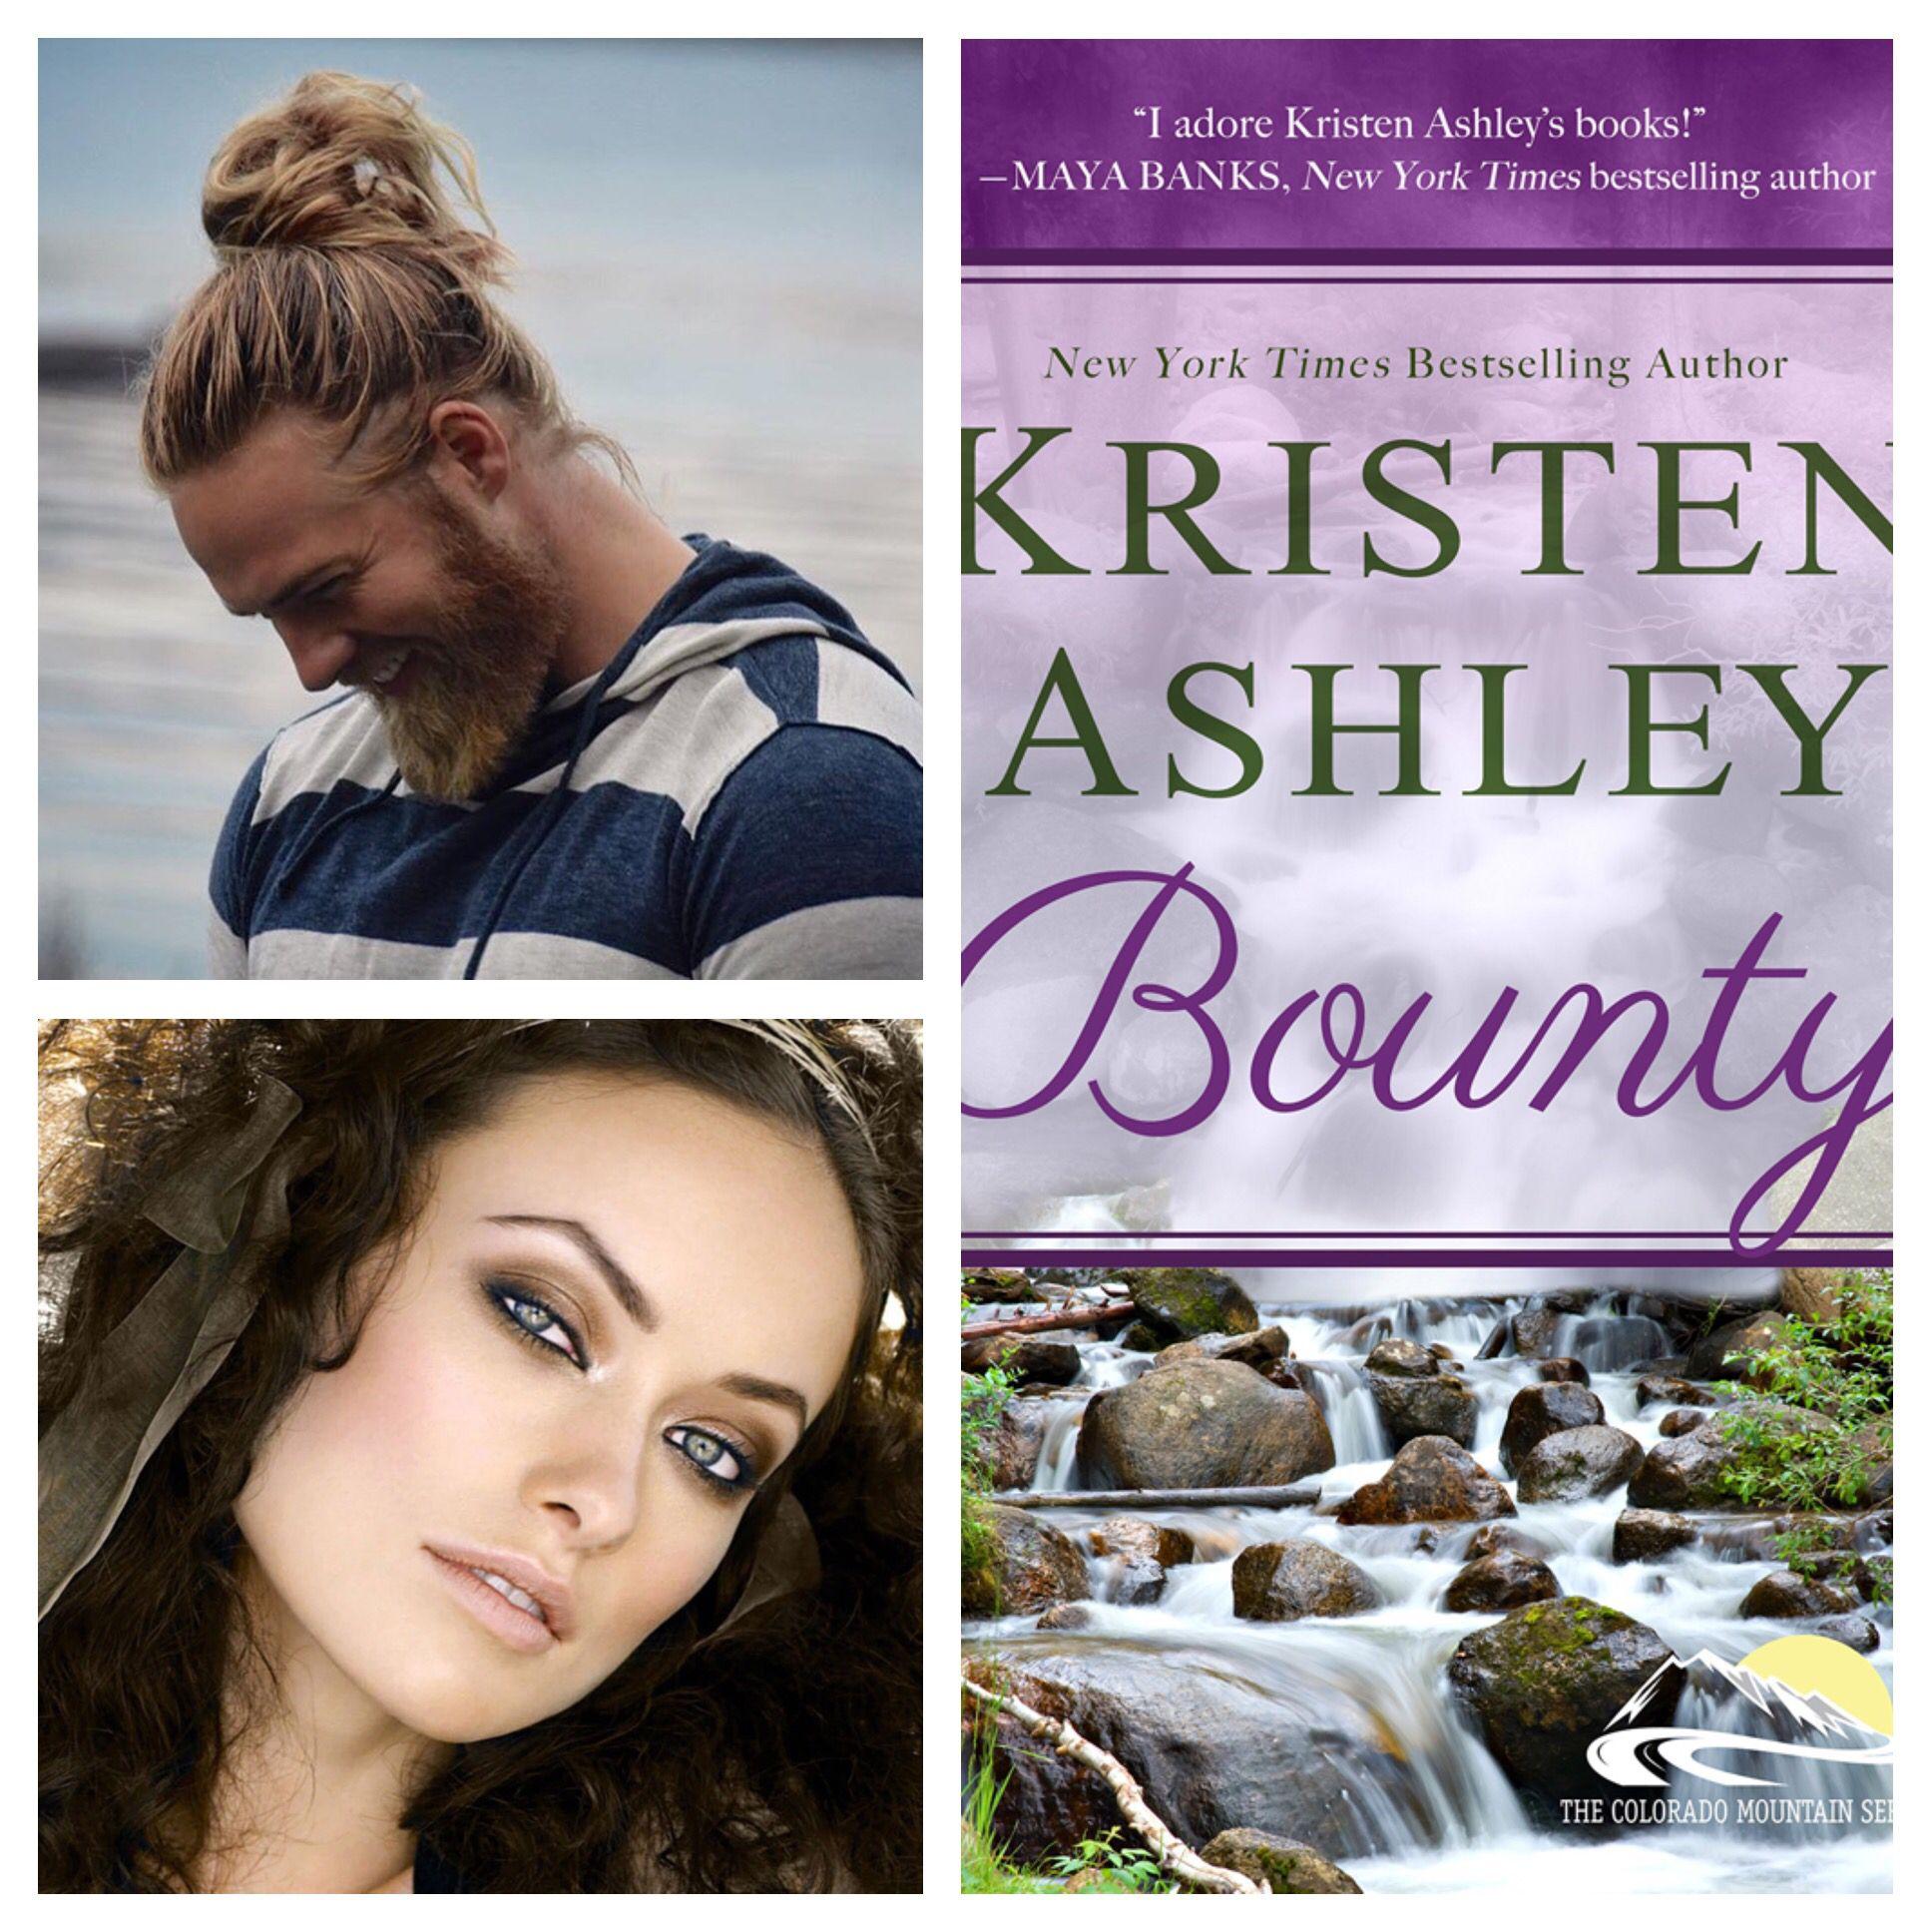 Bounty By Kristen Ashley Deke Hightower And Justice Lonesome Kristen Ashley Books Kristen Ashley Kristen